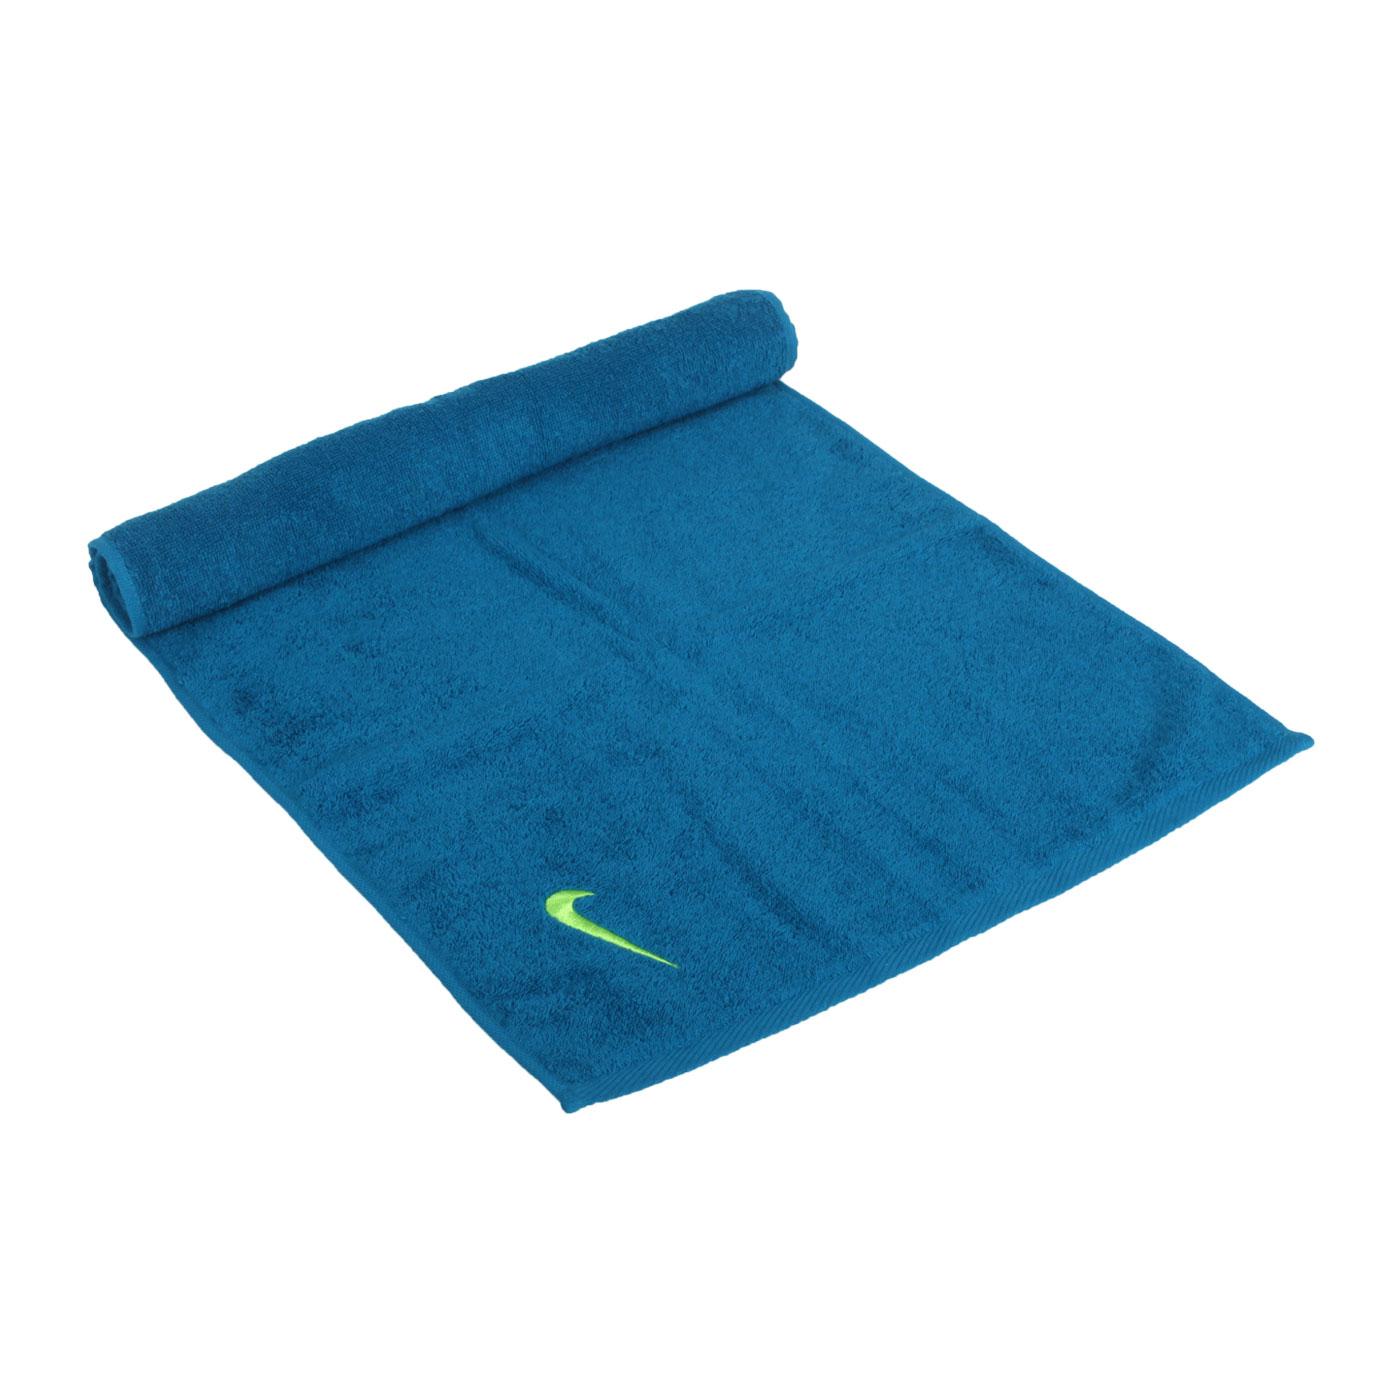 NIKE 毛巾(80*35cm) N1001541307NS - 藍綠